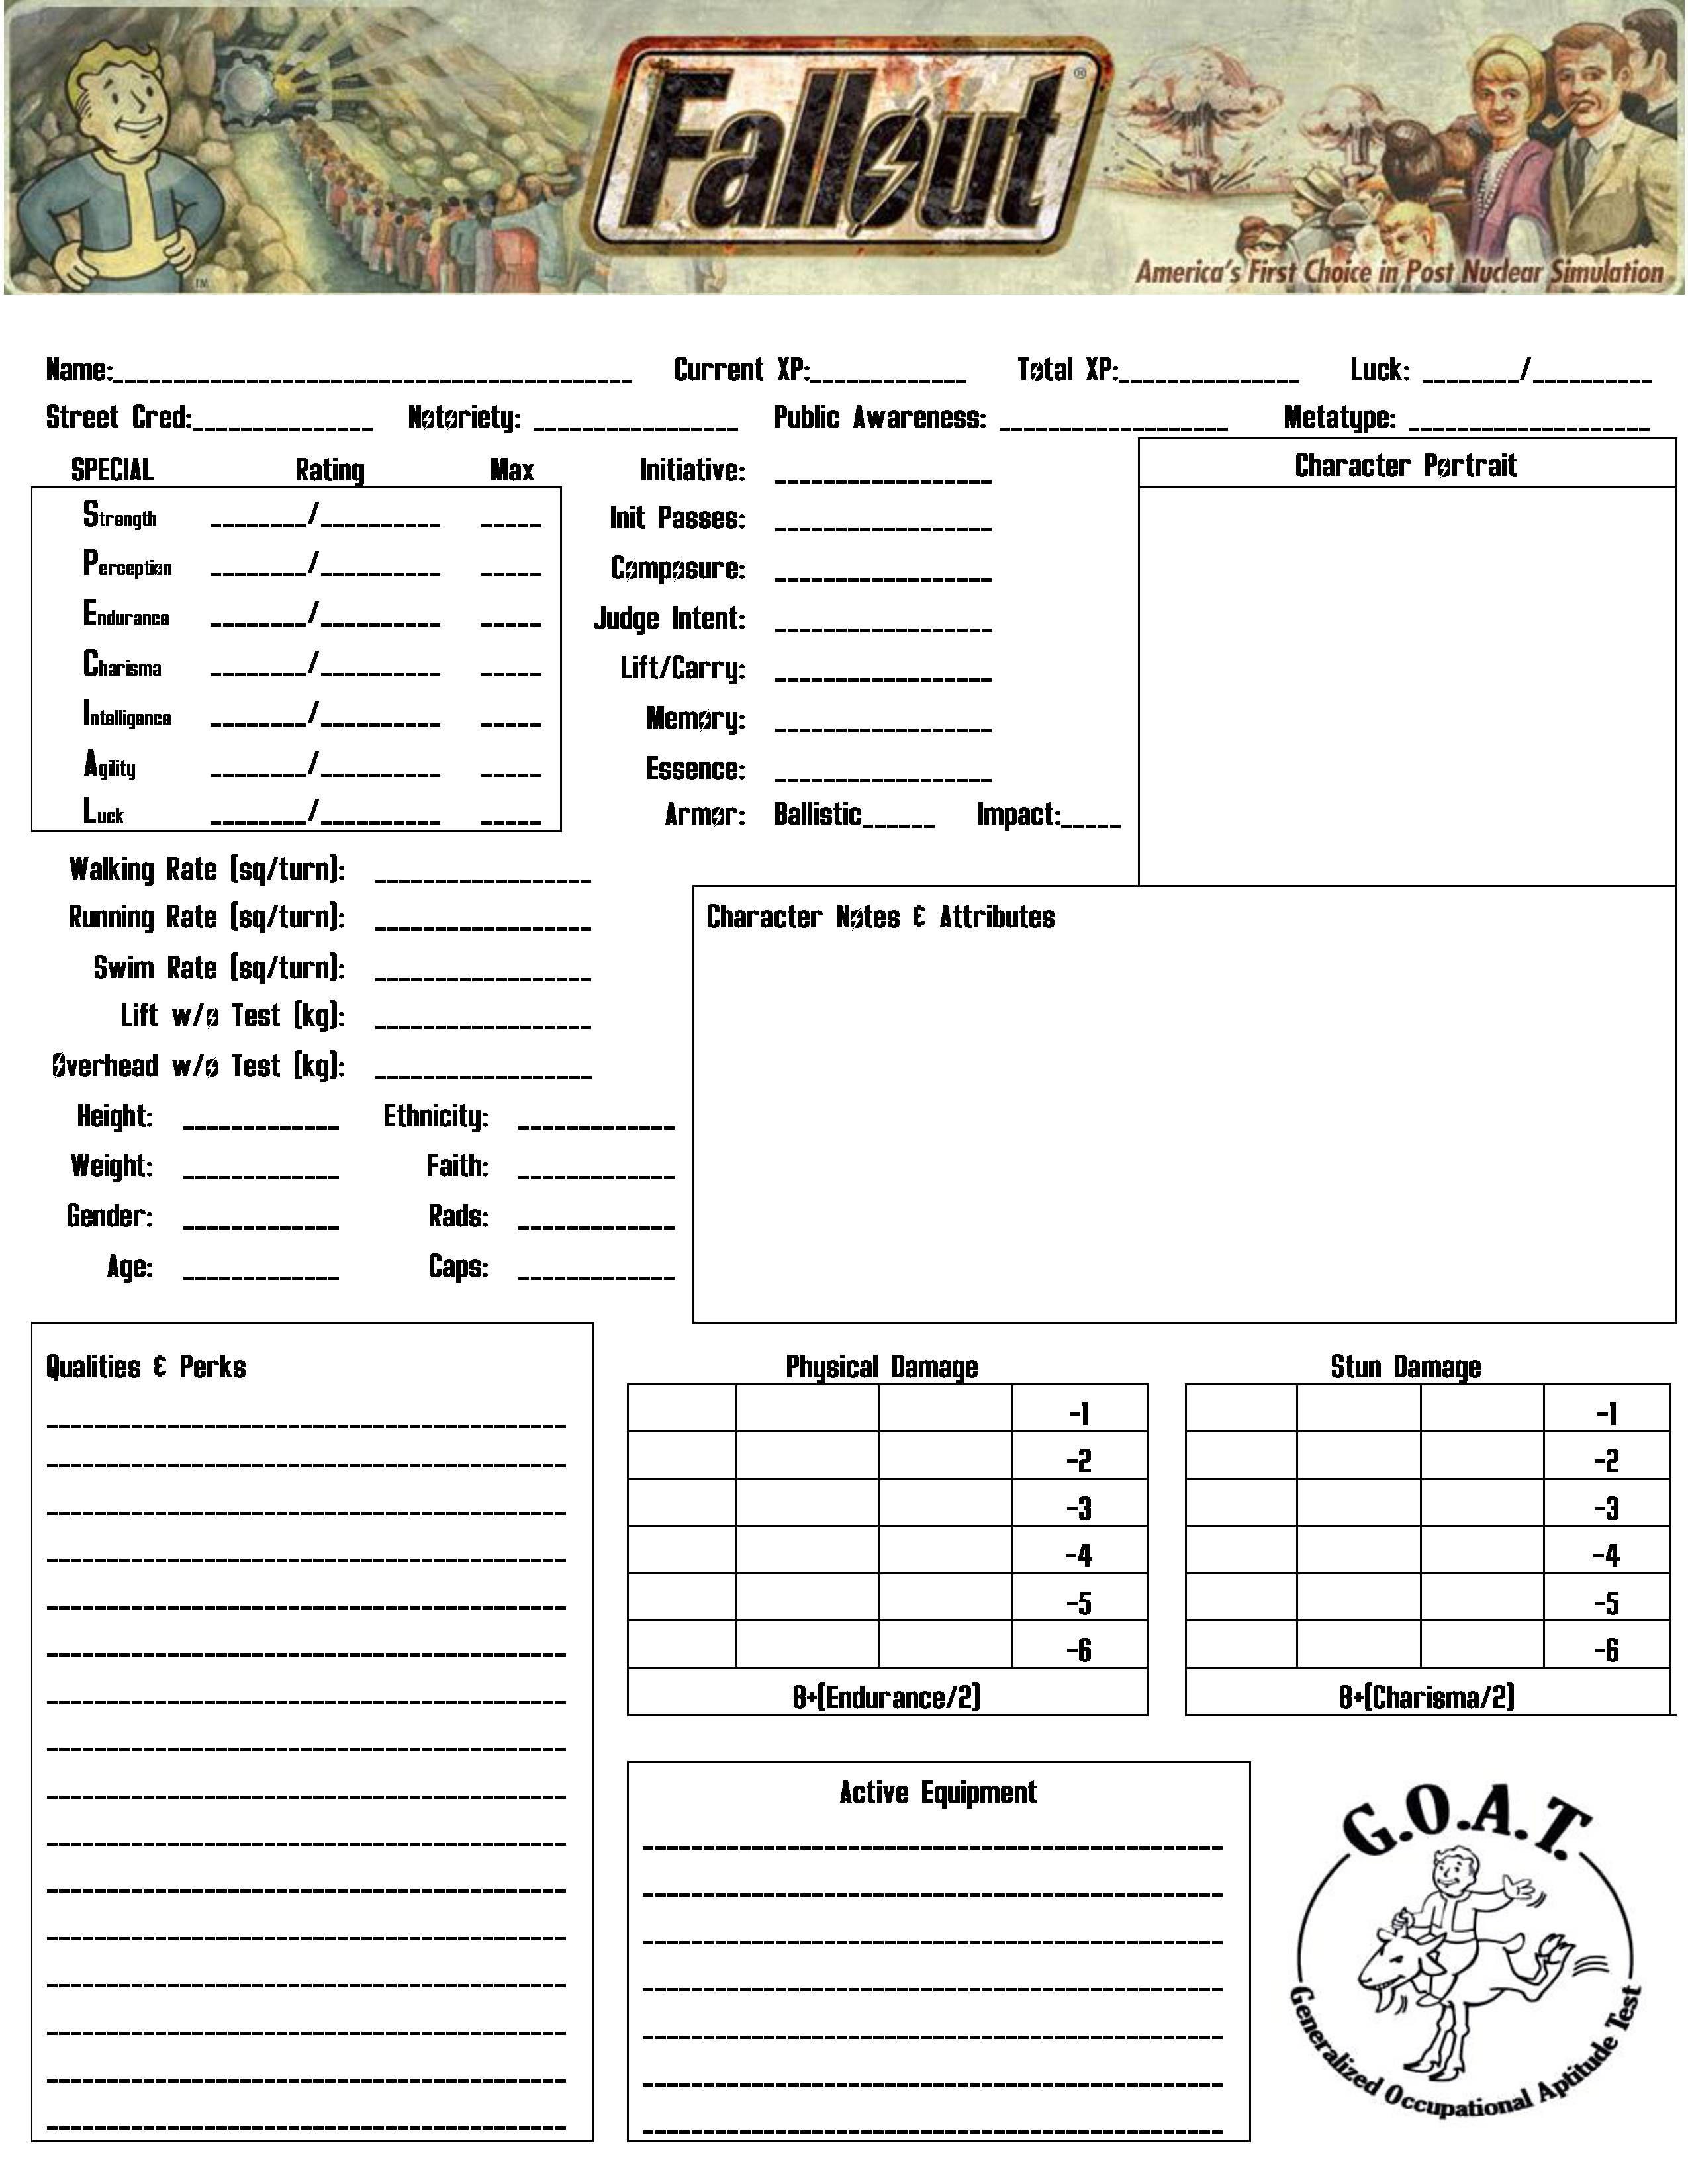 Fallout Nuclear Shadows Character Sheet